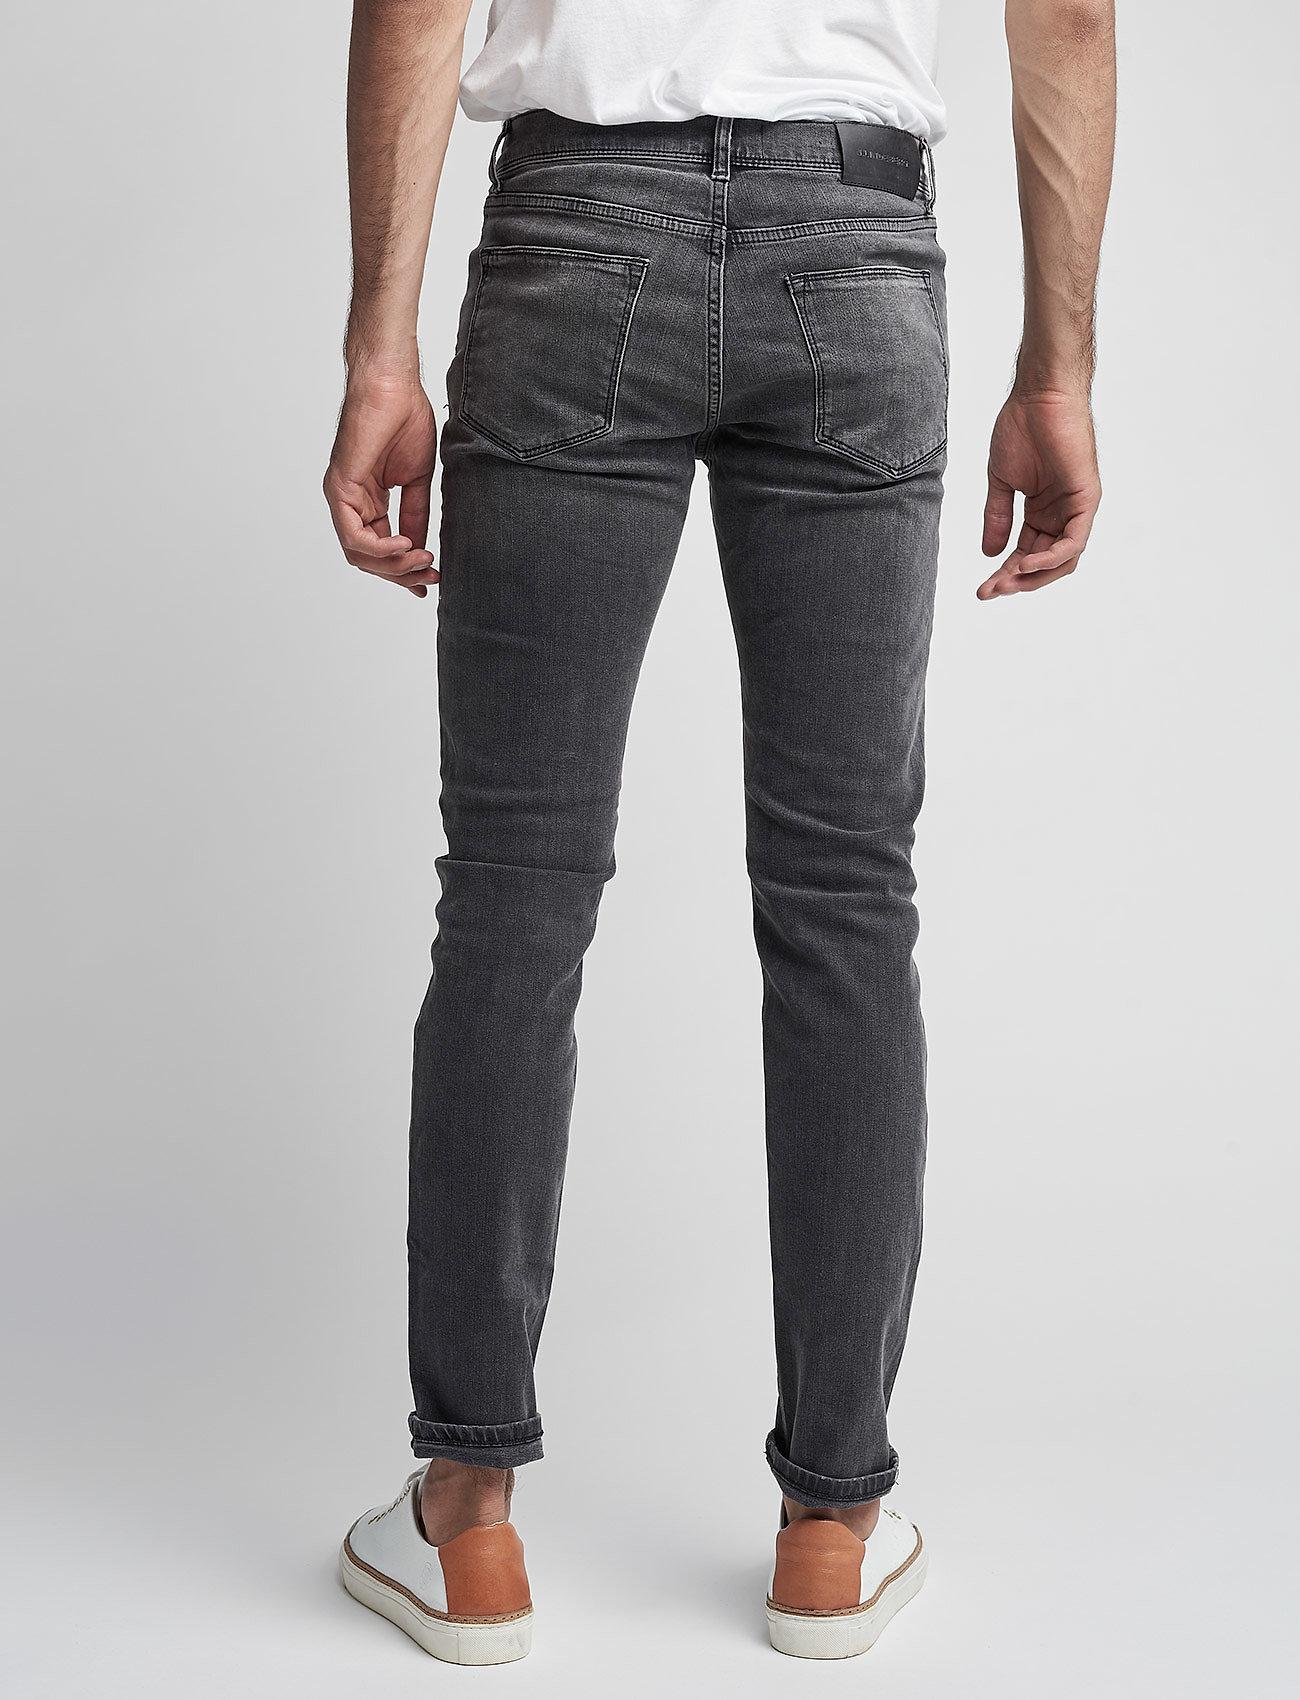 J. Lindeberg Damien Shadow - Jeans LT GREY - Menn Klær